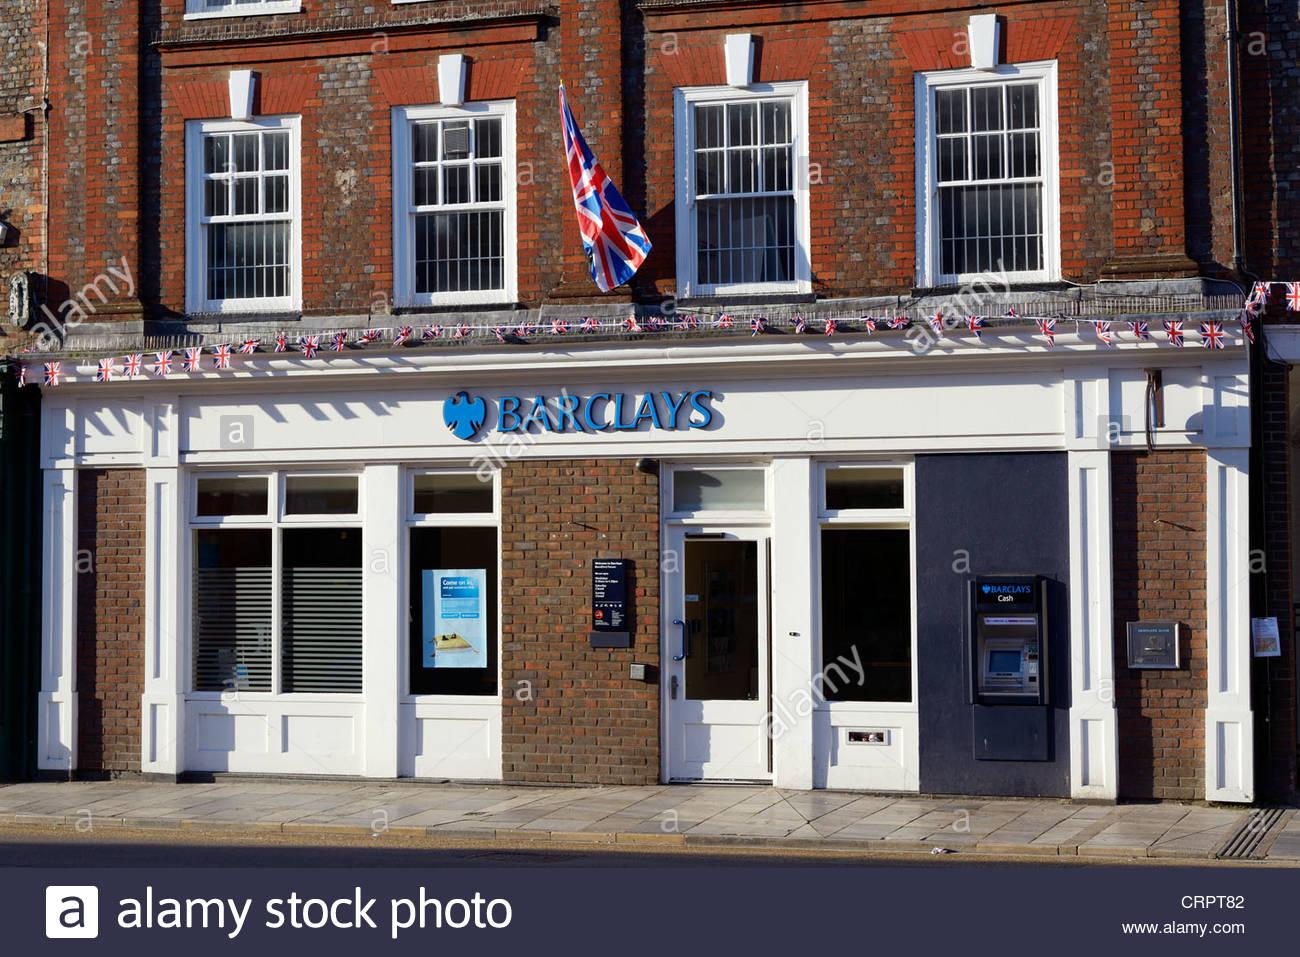 Barclays highstreet branch Bank, Blandford Forum, Dorset England - Stock Image